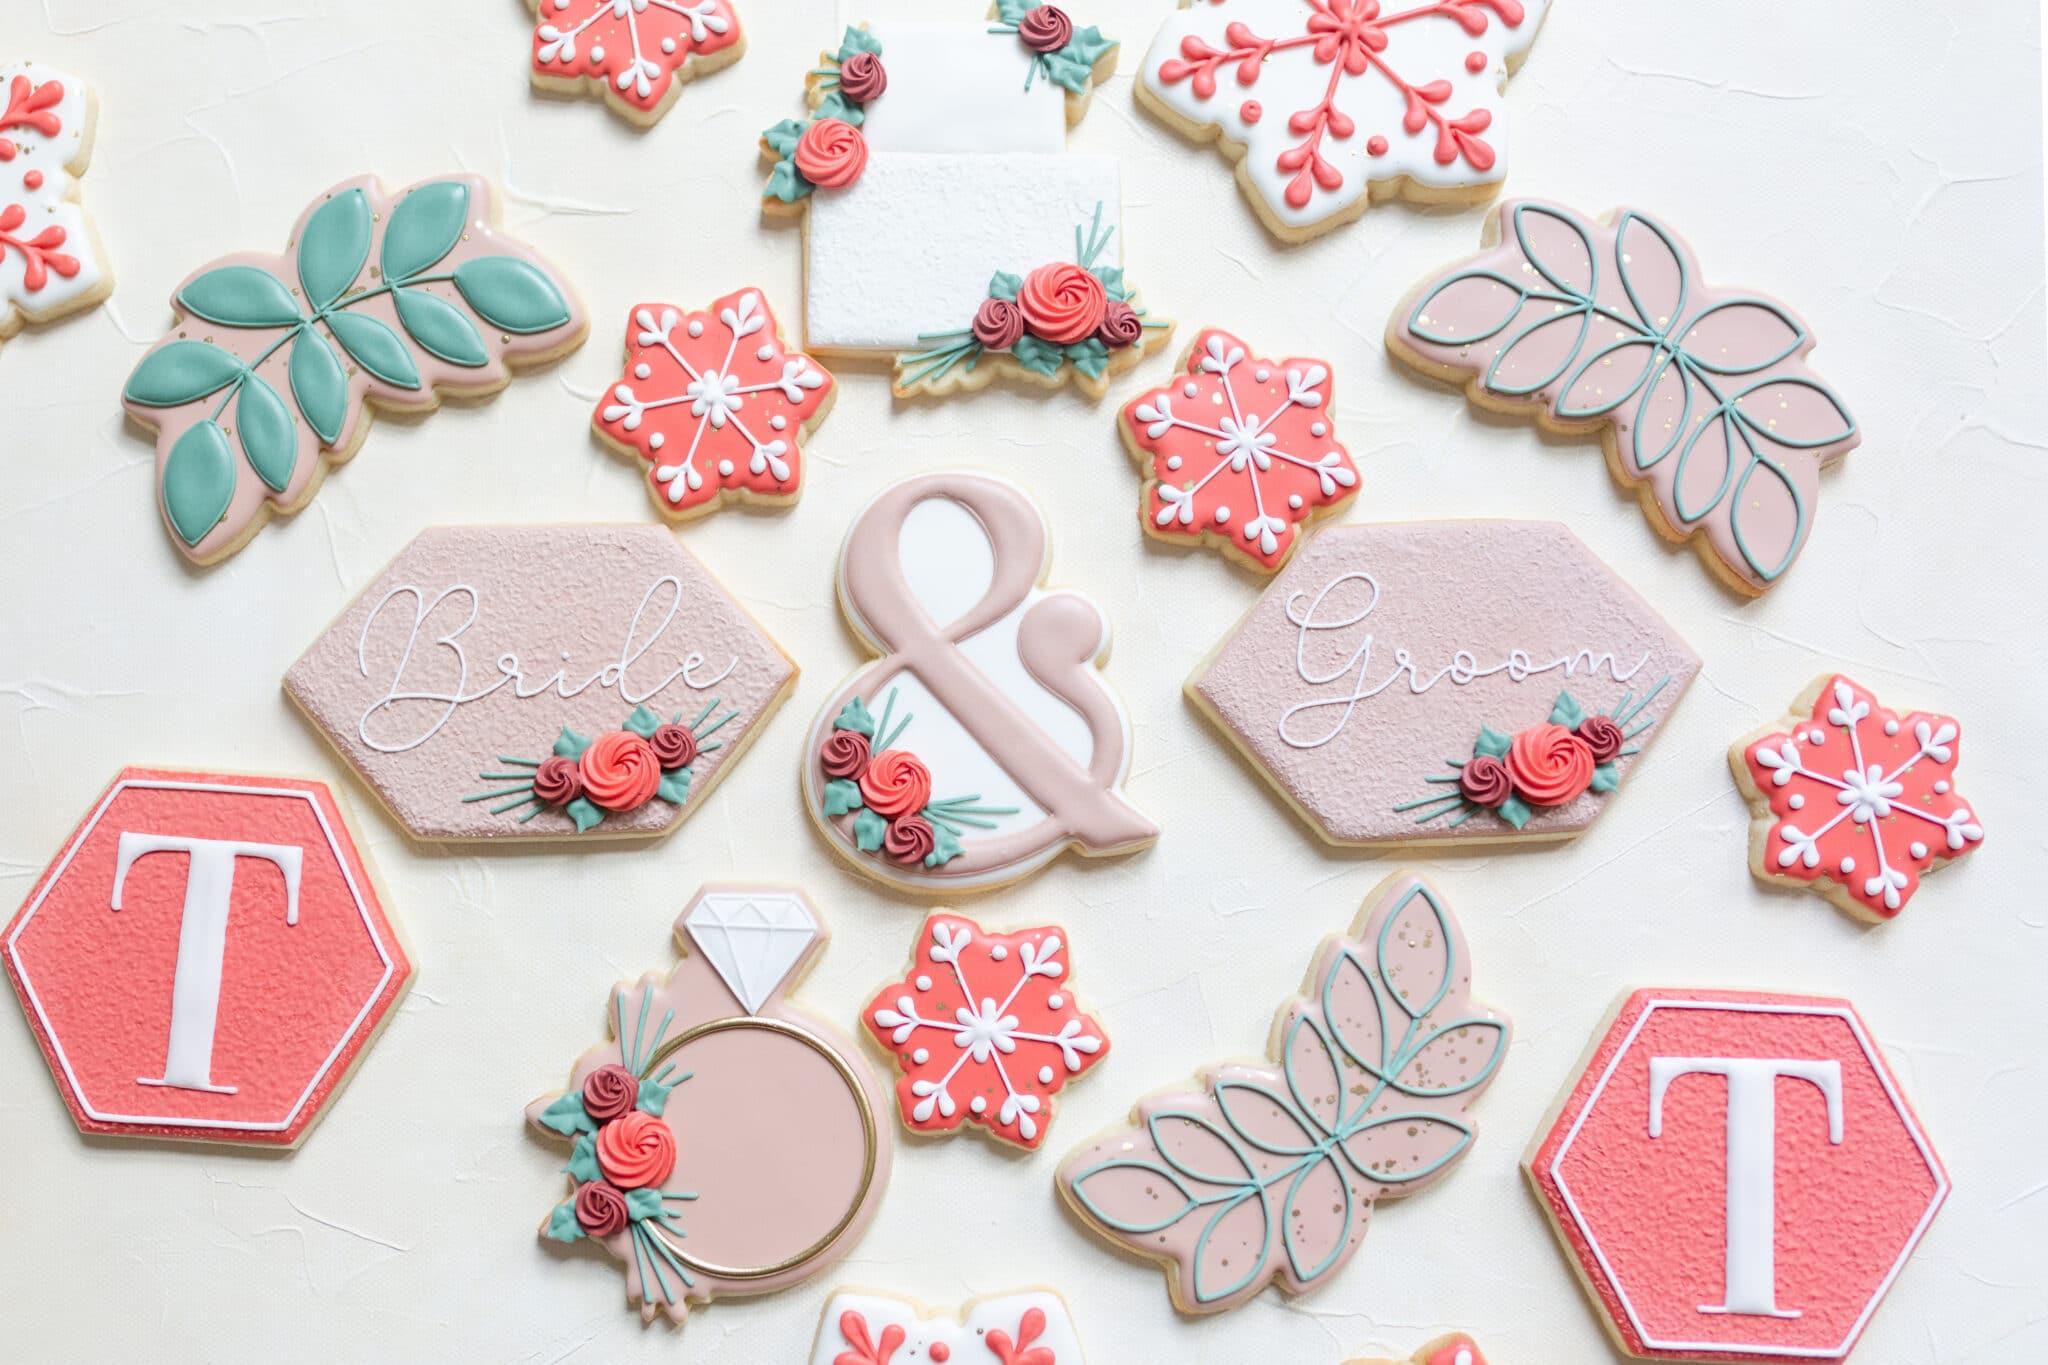 Christmas themed wedding inspiration cookies